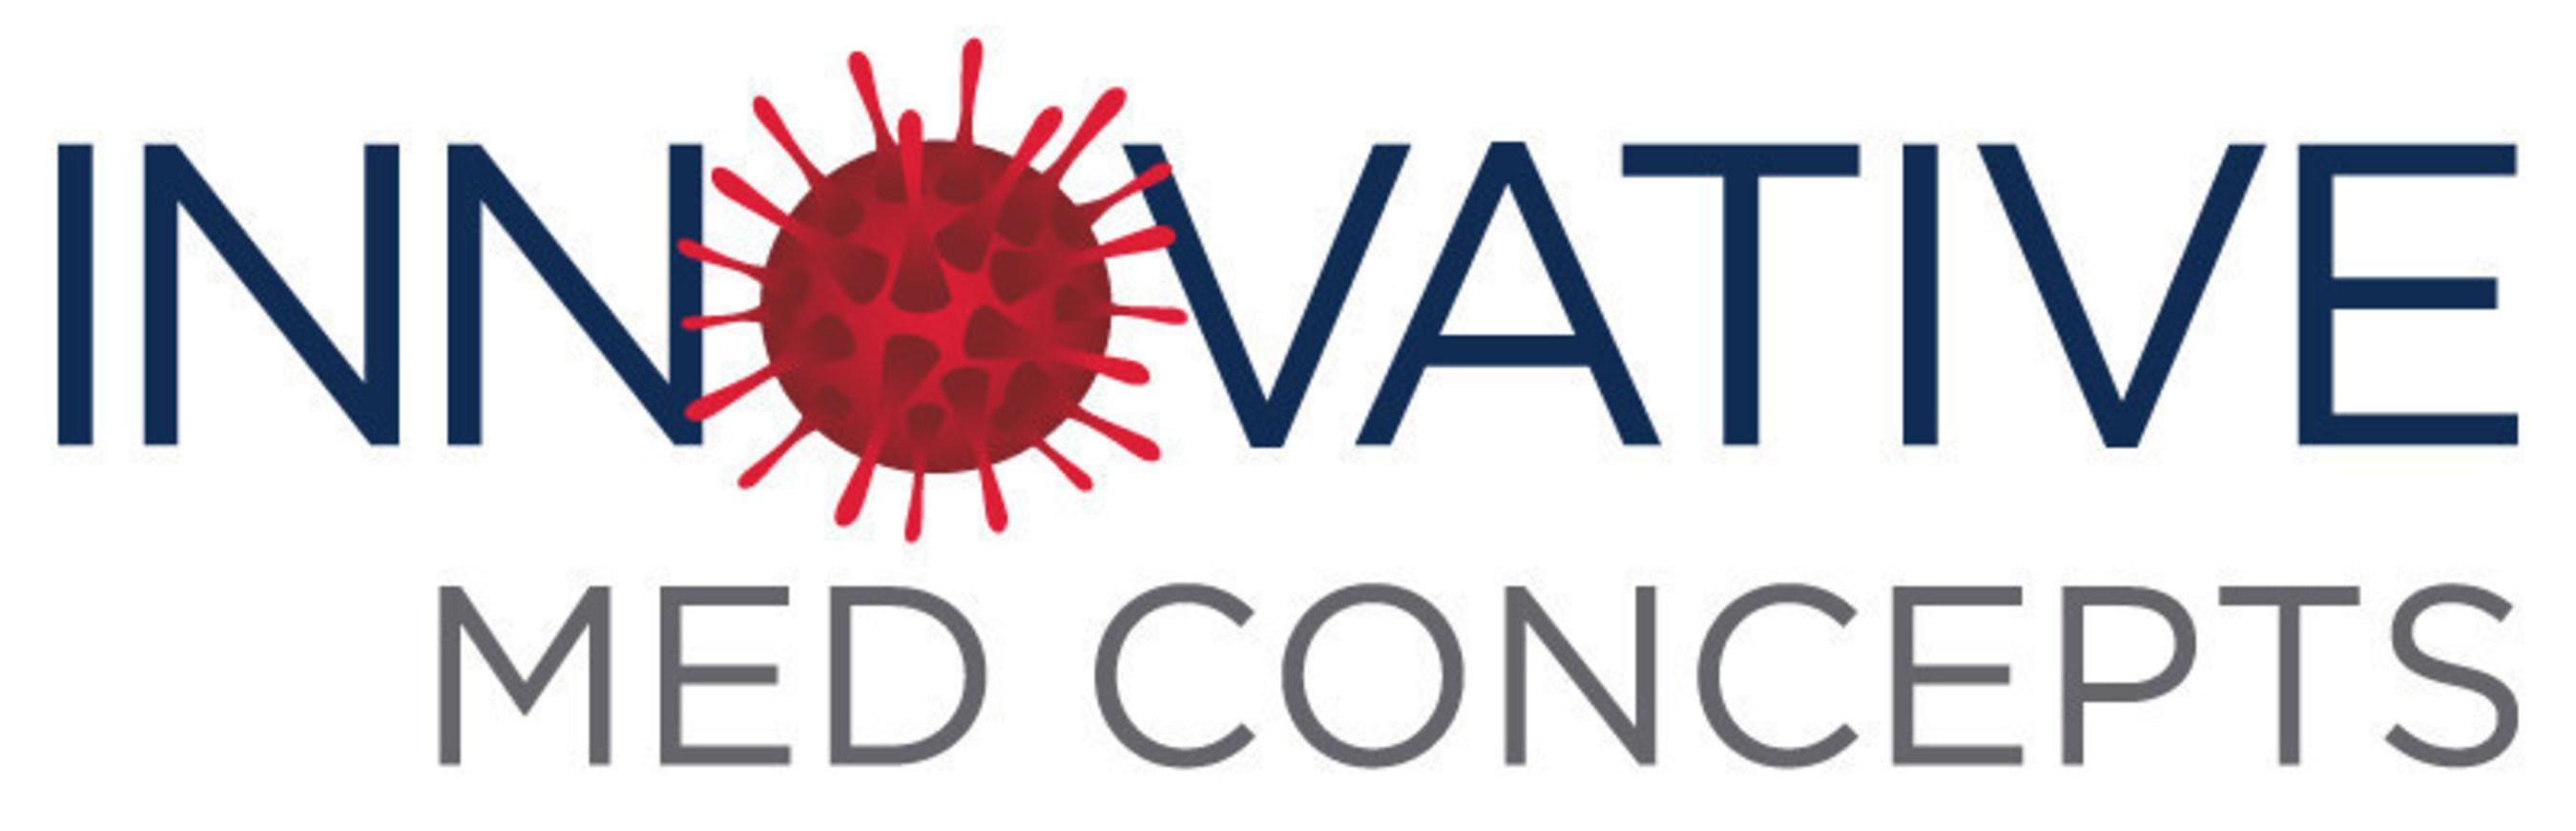 Innovative Med Concepts Announces Receipt of FDA Fast Track Designation for IMC-1, a Novel